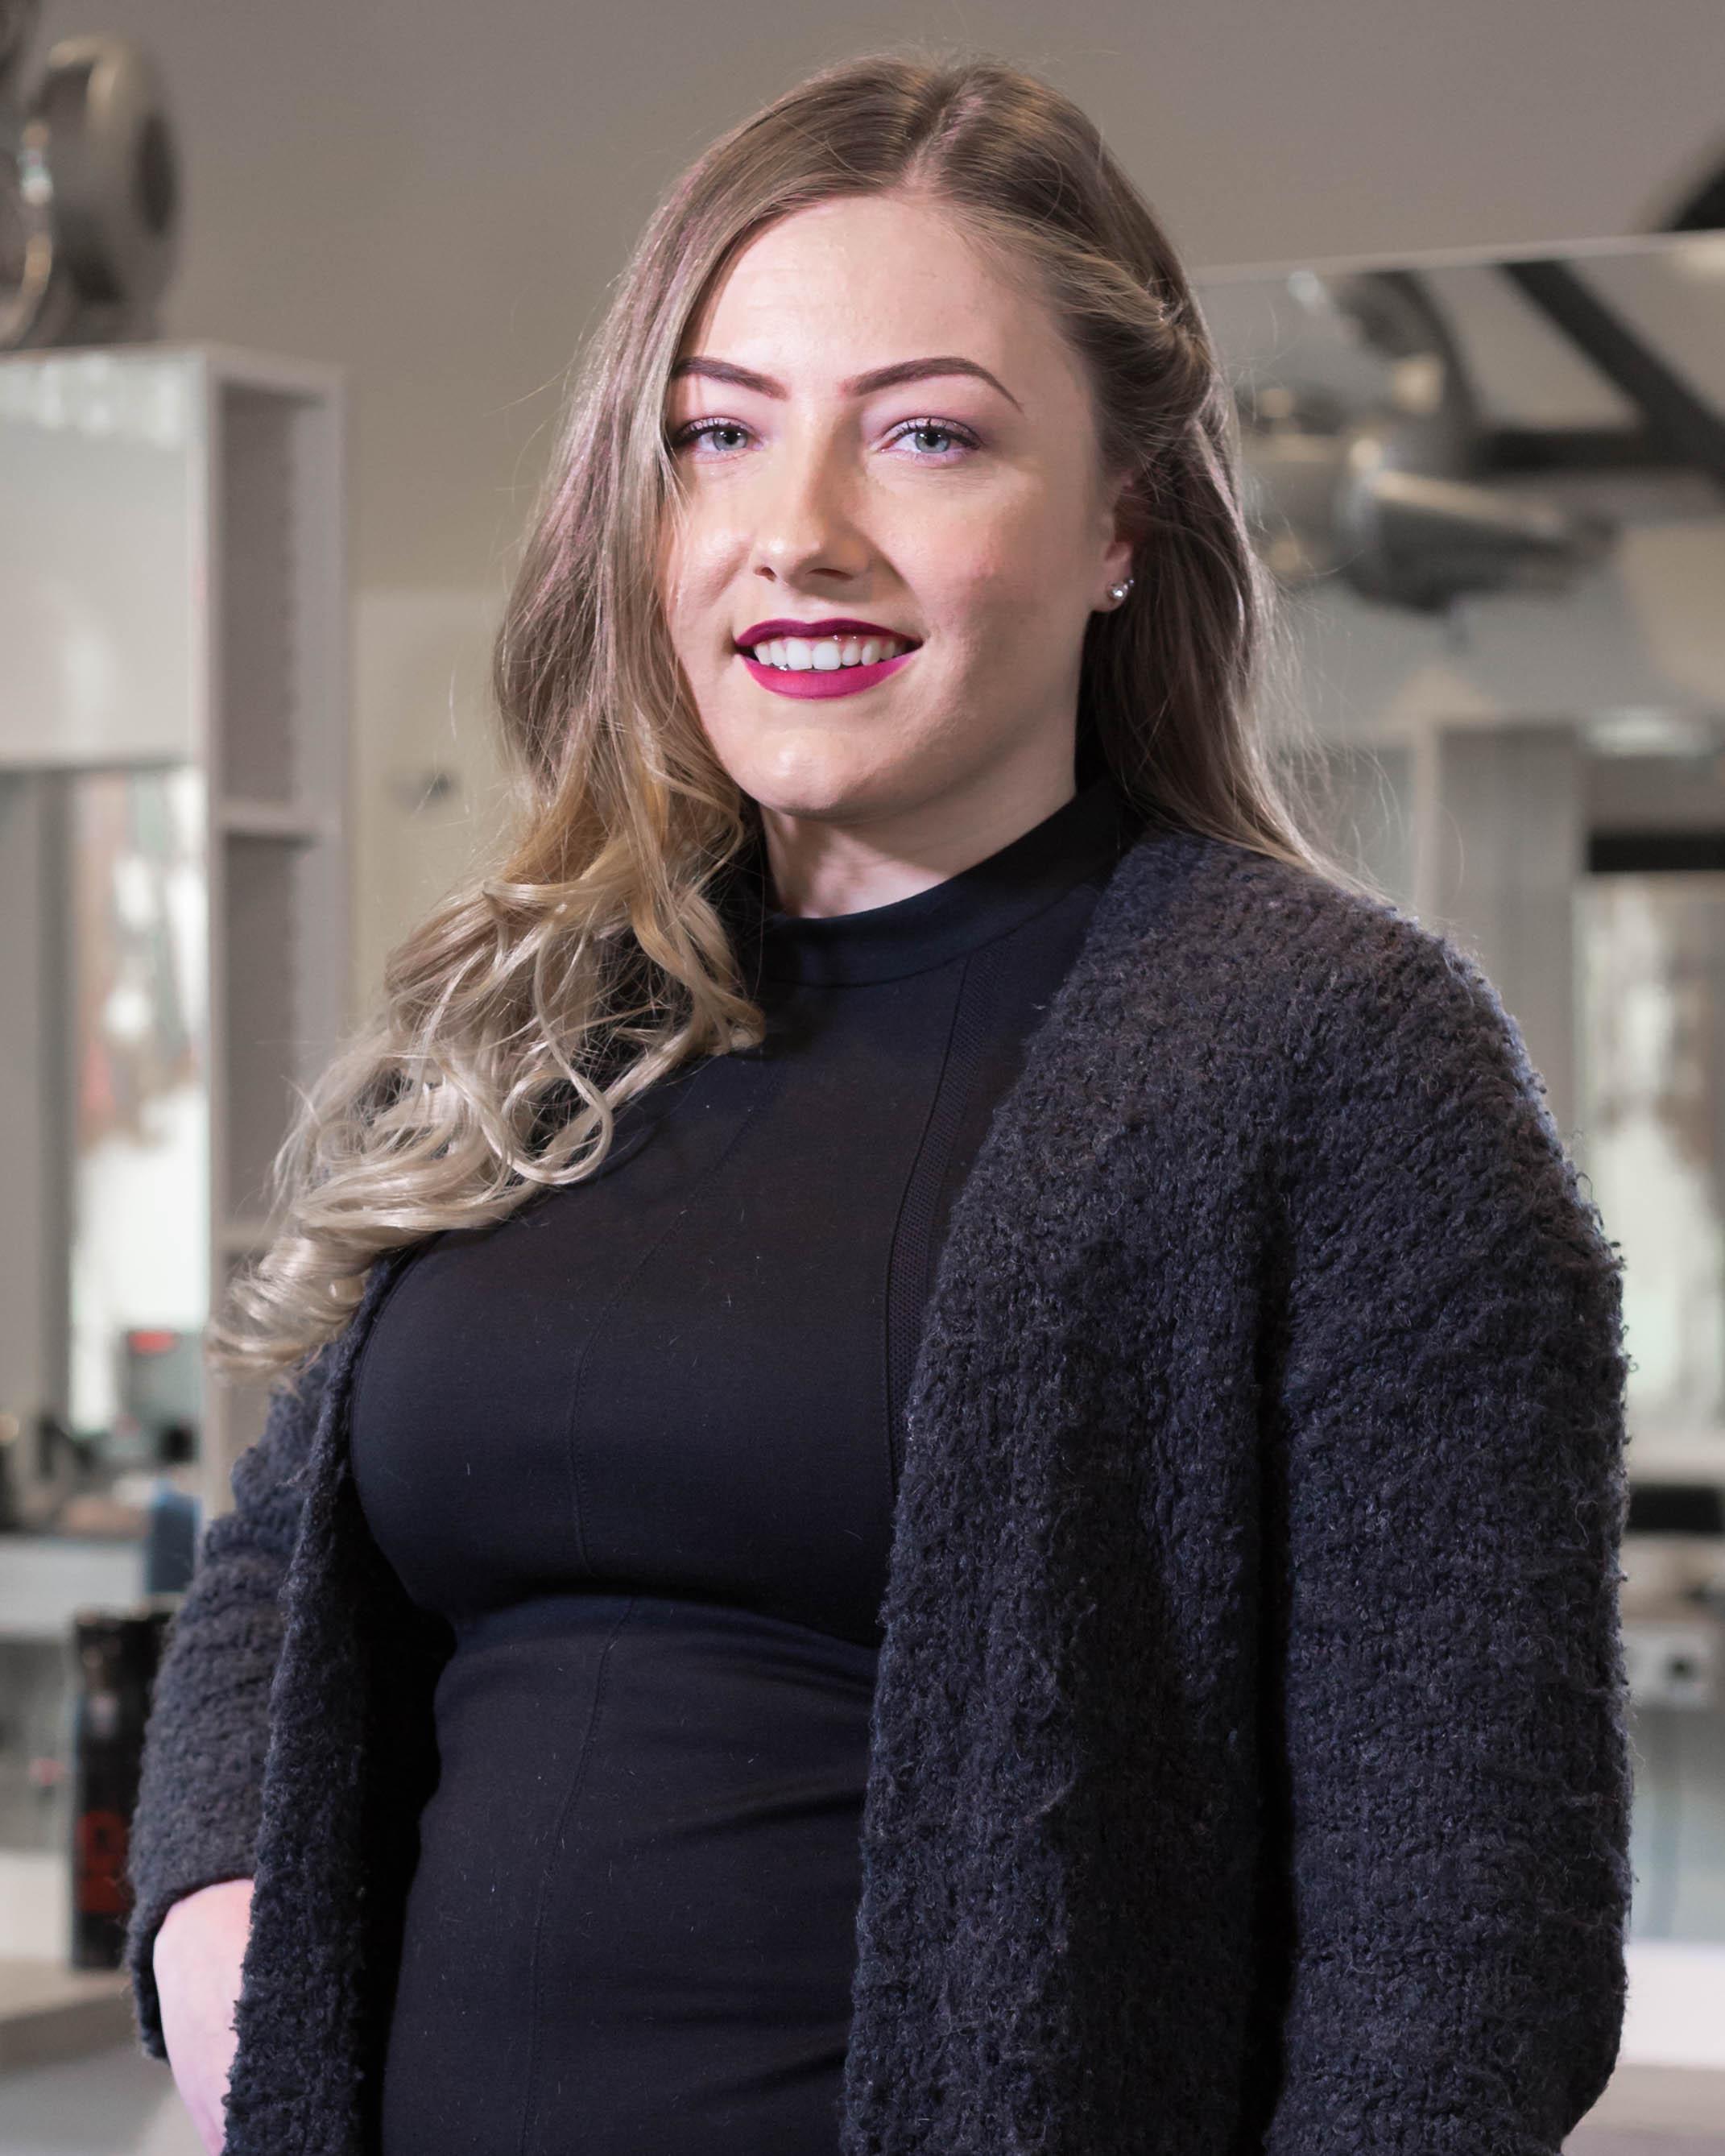 Carlyn - Kapper bij Hairstyling Hélène Stellendam